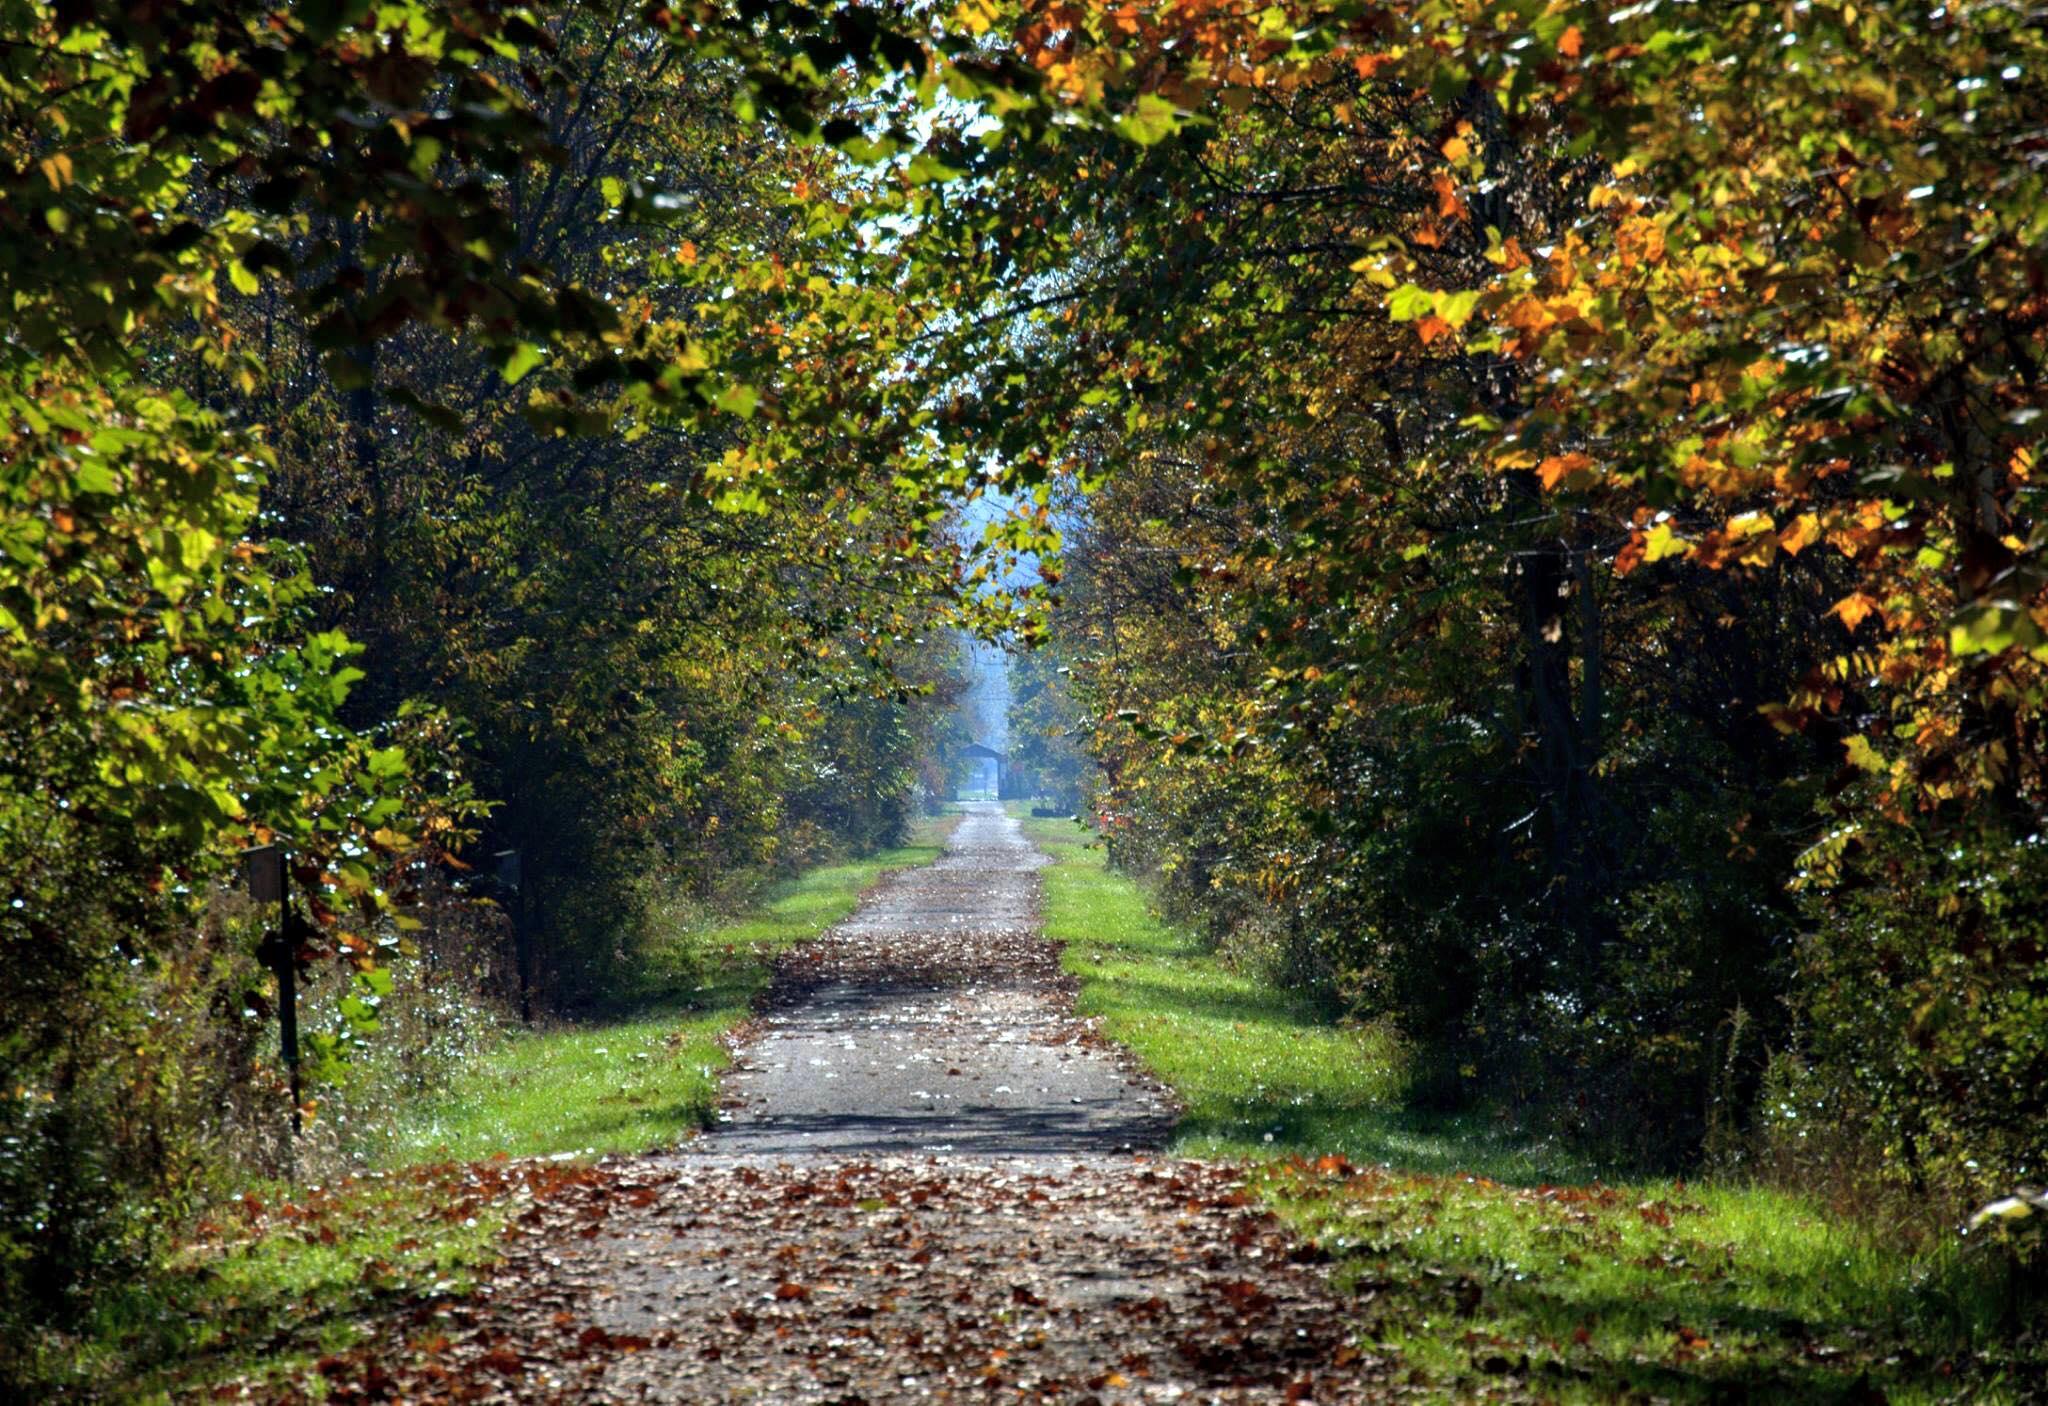 Conotton Creek Trail. (photo courtesy of Dee Ann Horstman)